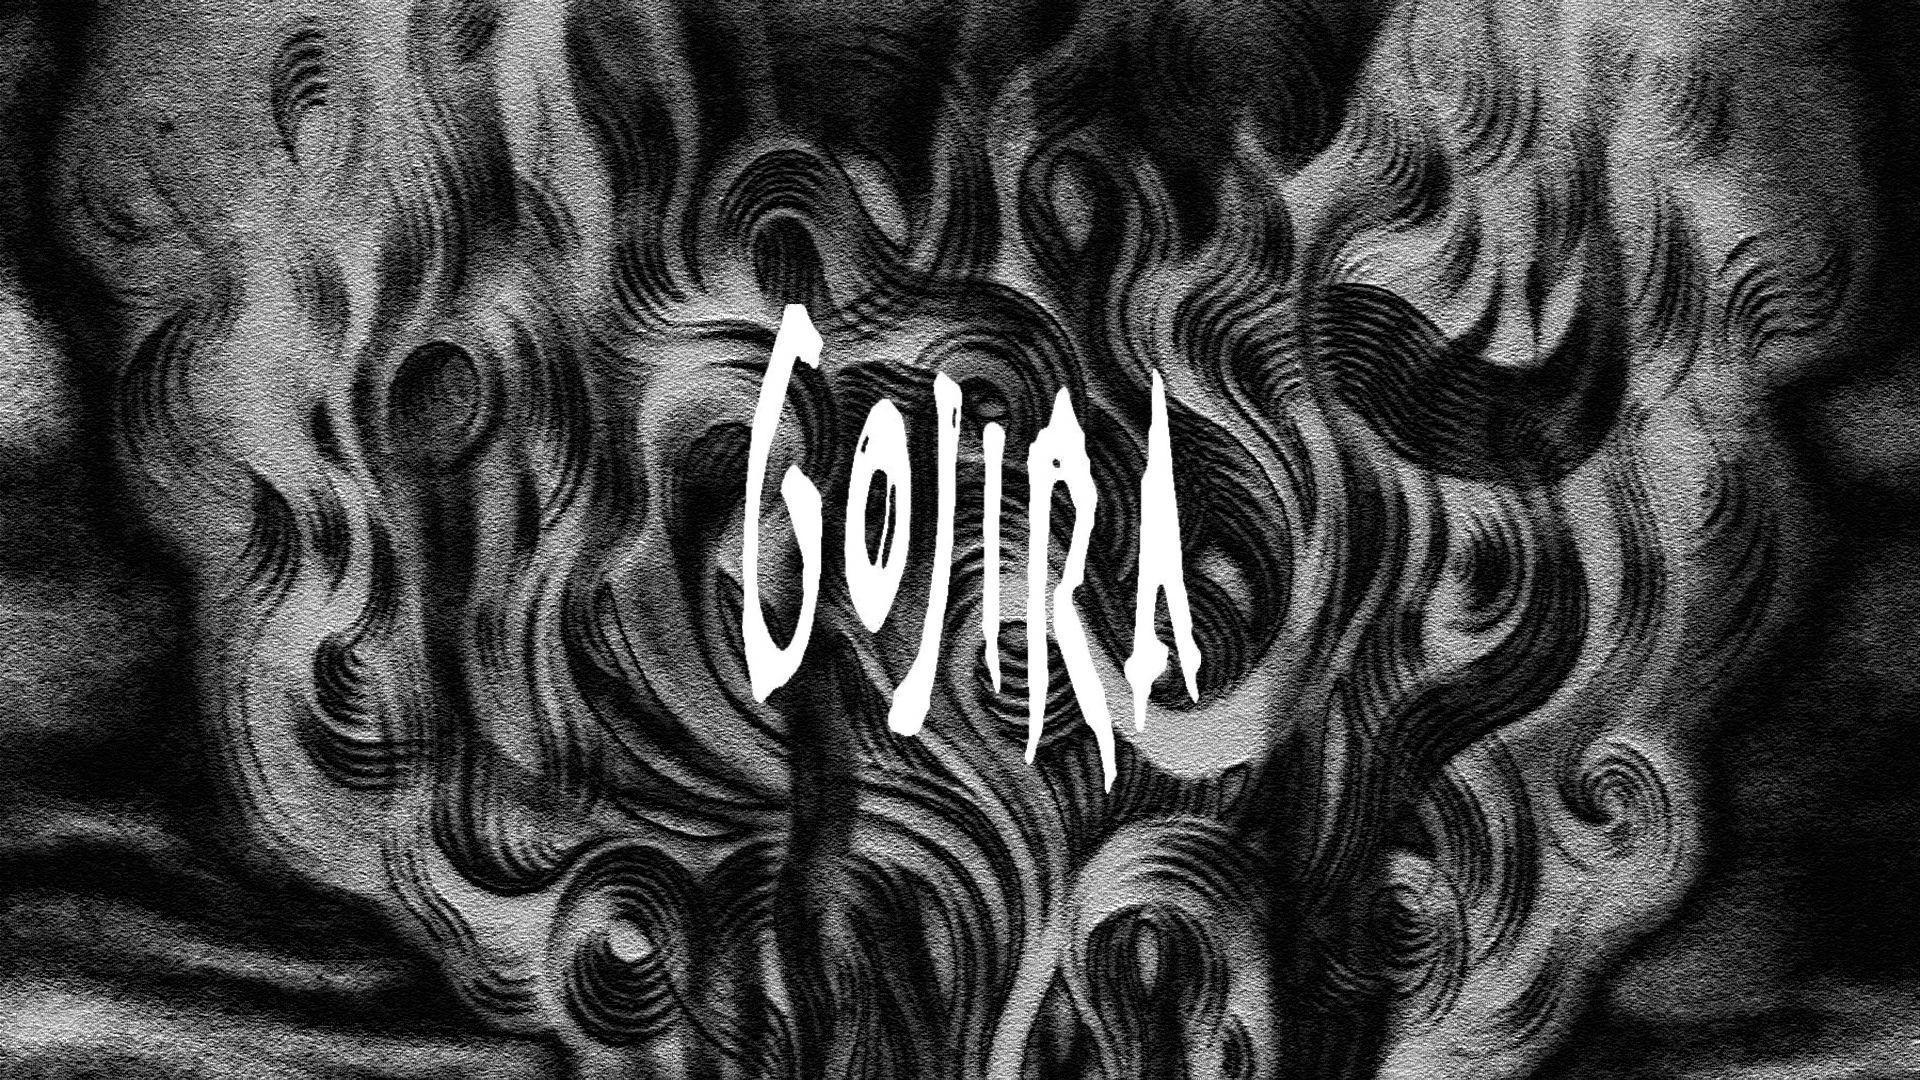 Gojira Wallpaper 76 images 1920x1080